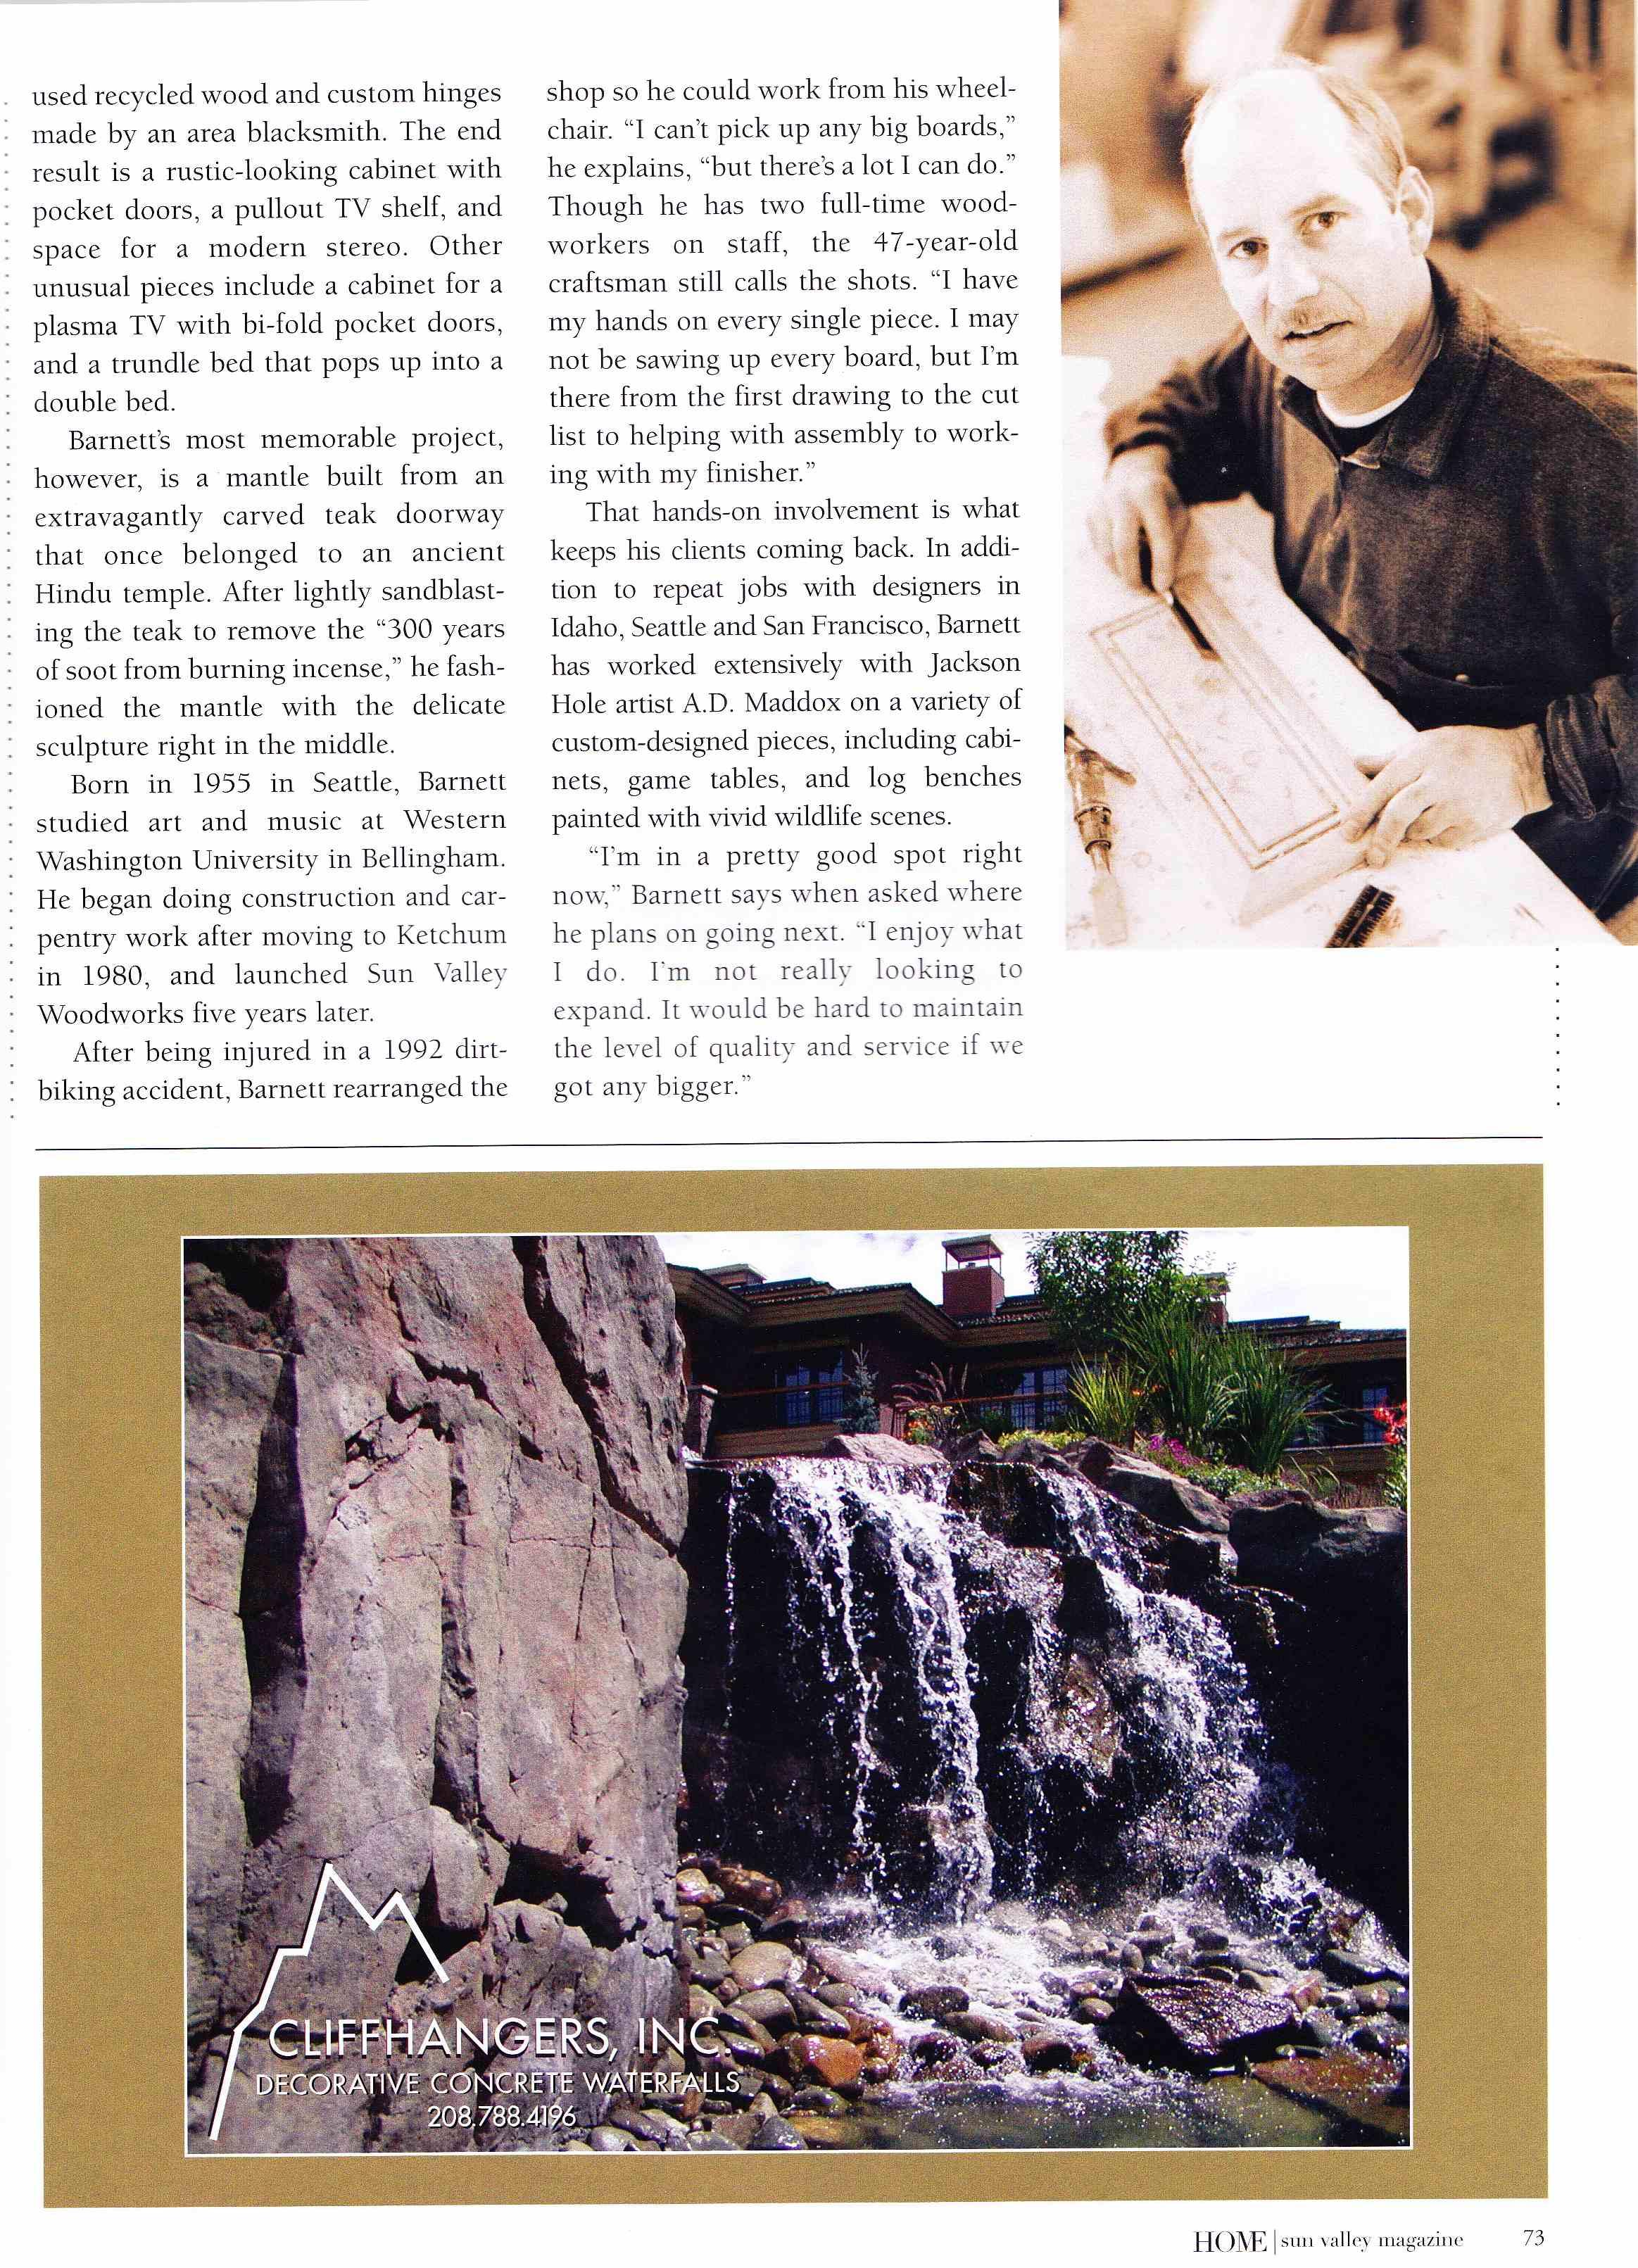 SV Magazine, third page